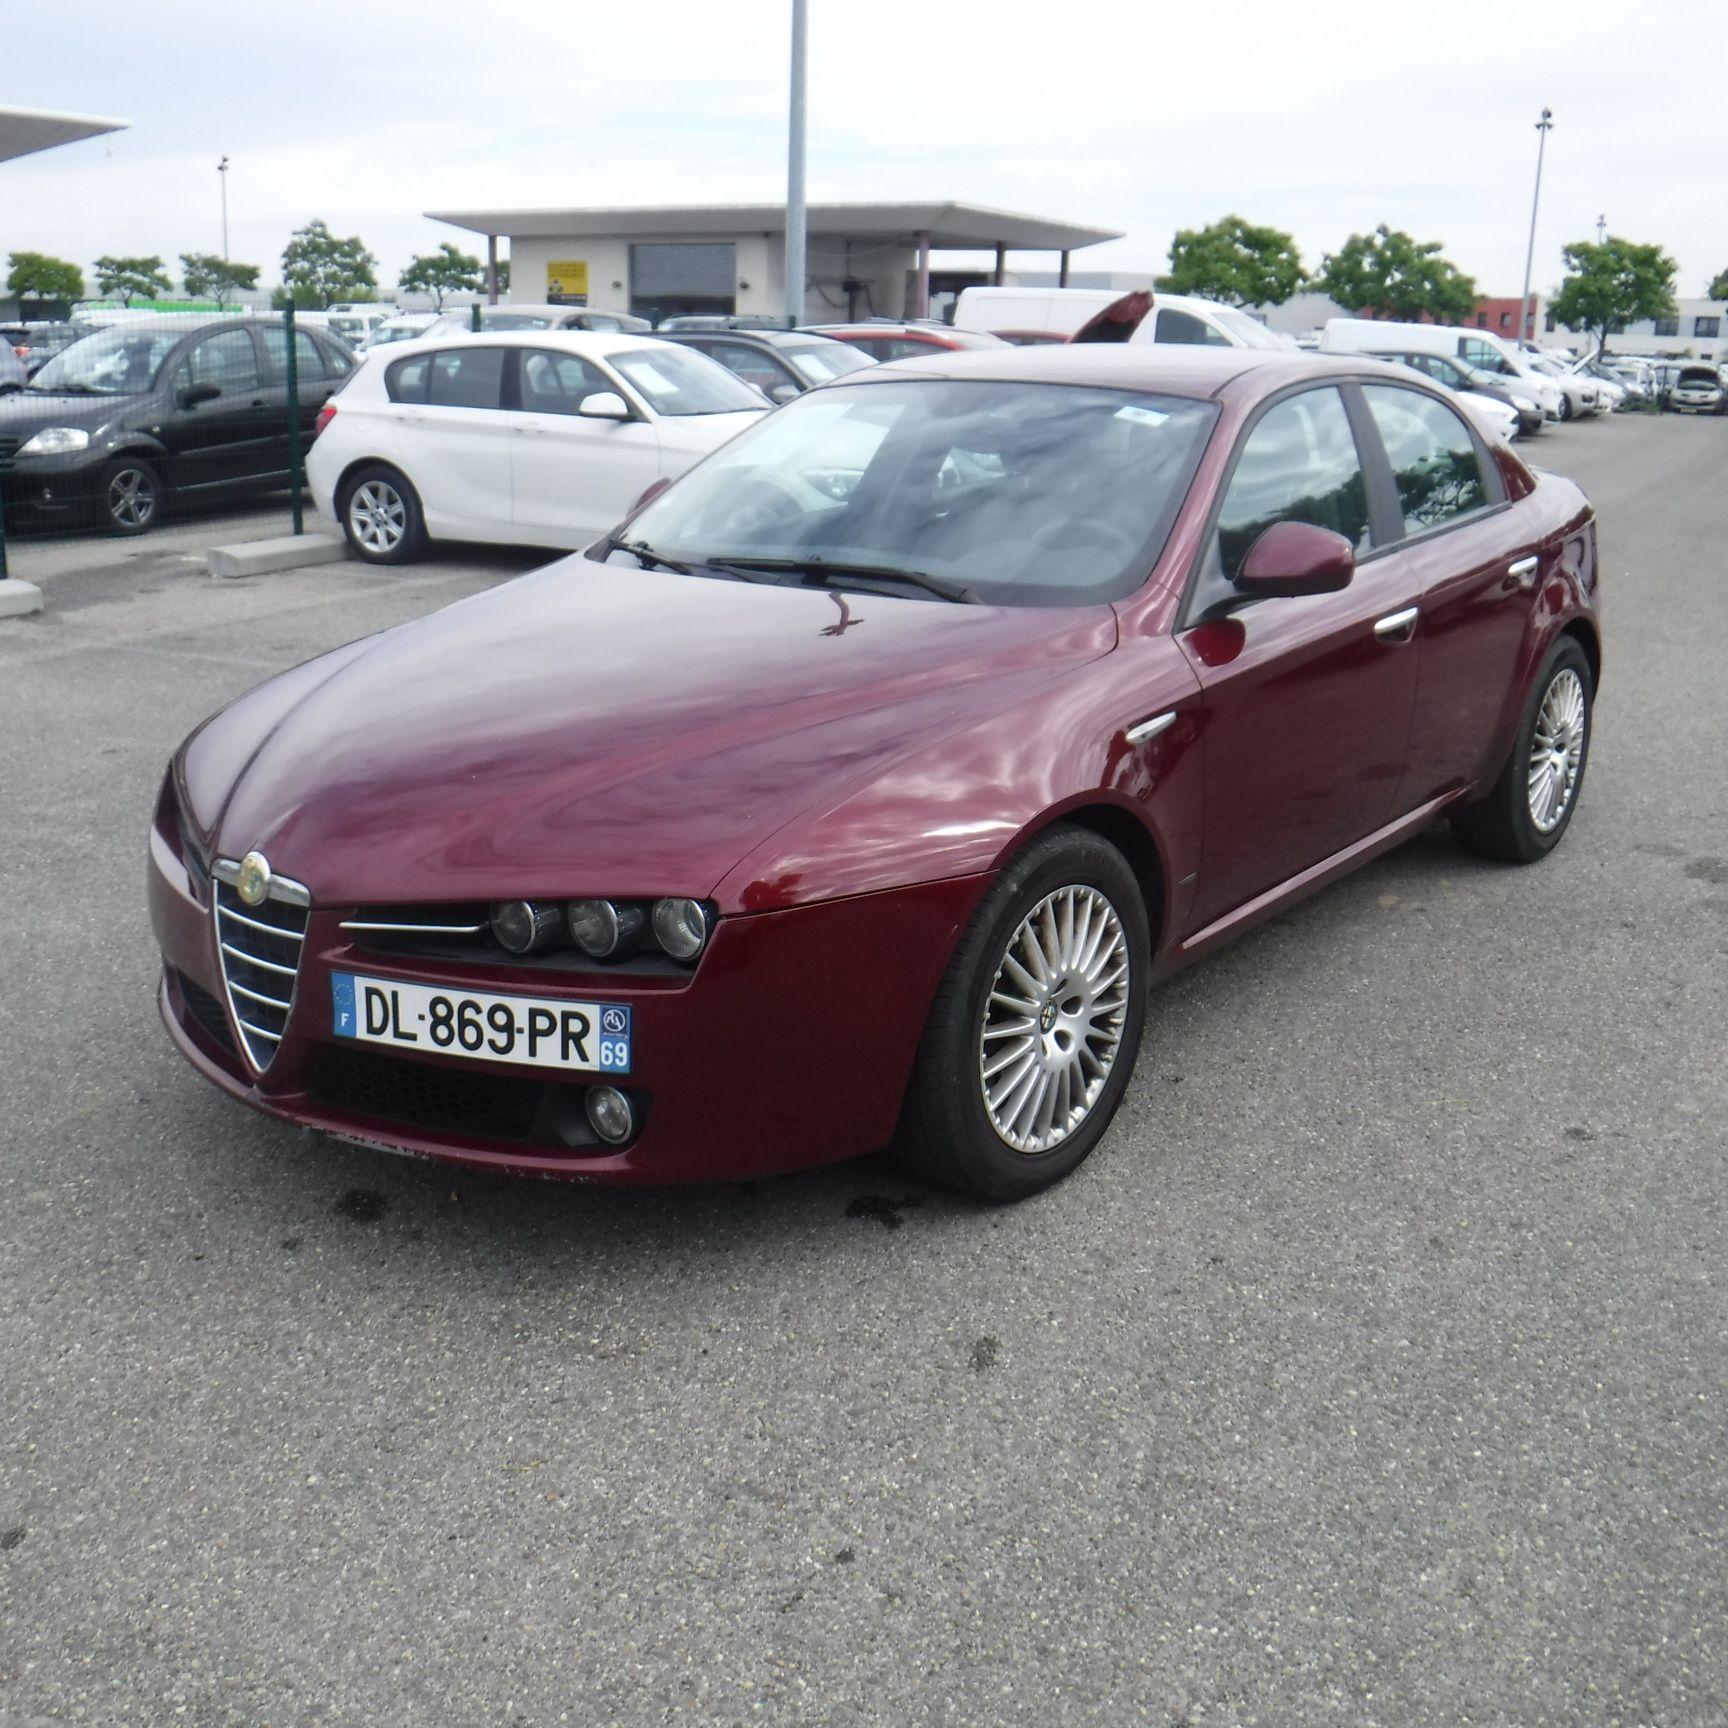 Alfa Romeo Lyon on alpha romeo, marseille romeo, alpine romeo, uggs on sale men's romeo, giulietta and romeo, things that describe romeo, ver videos de romeo,